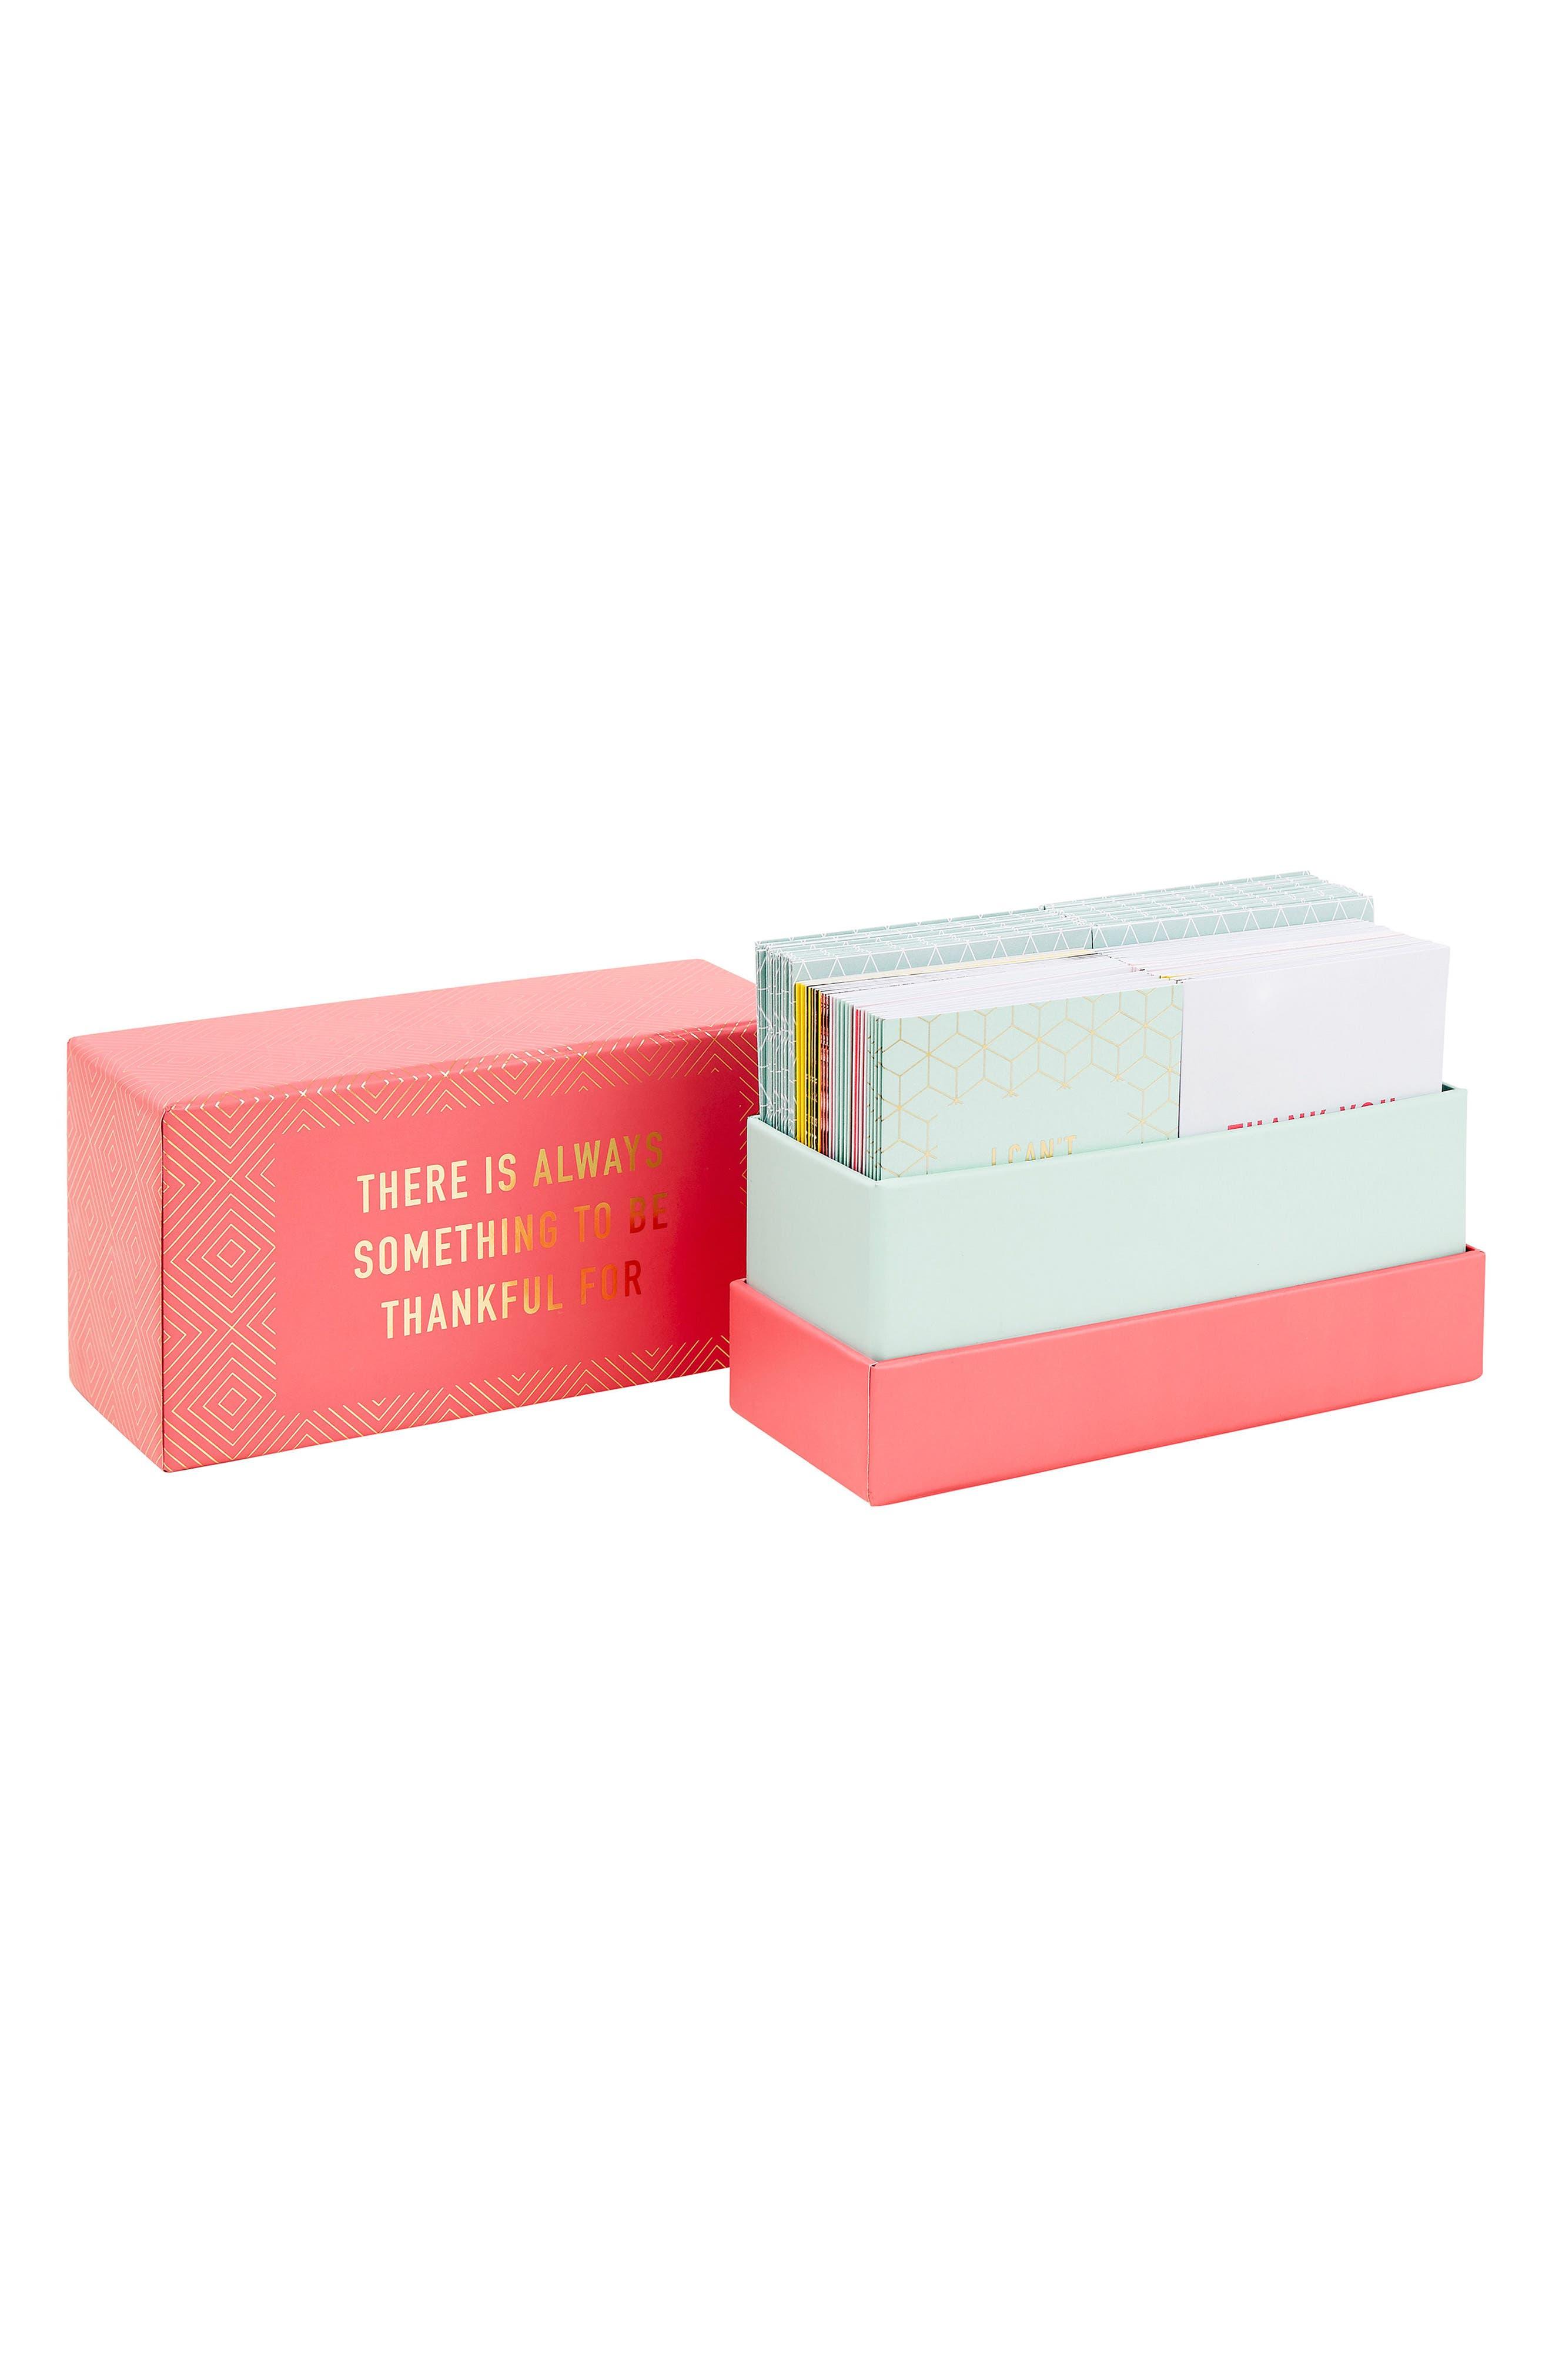 52 Inspirational Cards Box Set,                             Alternate thumbnail 3, color,                             Multi